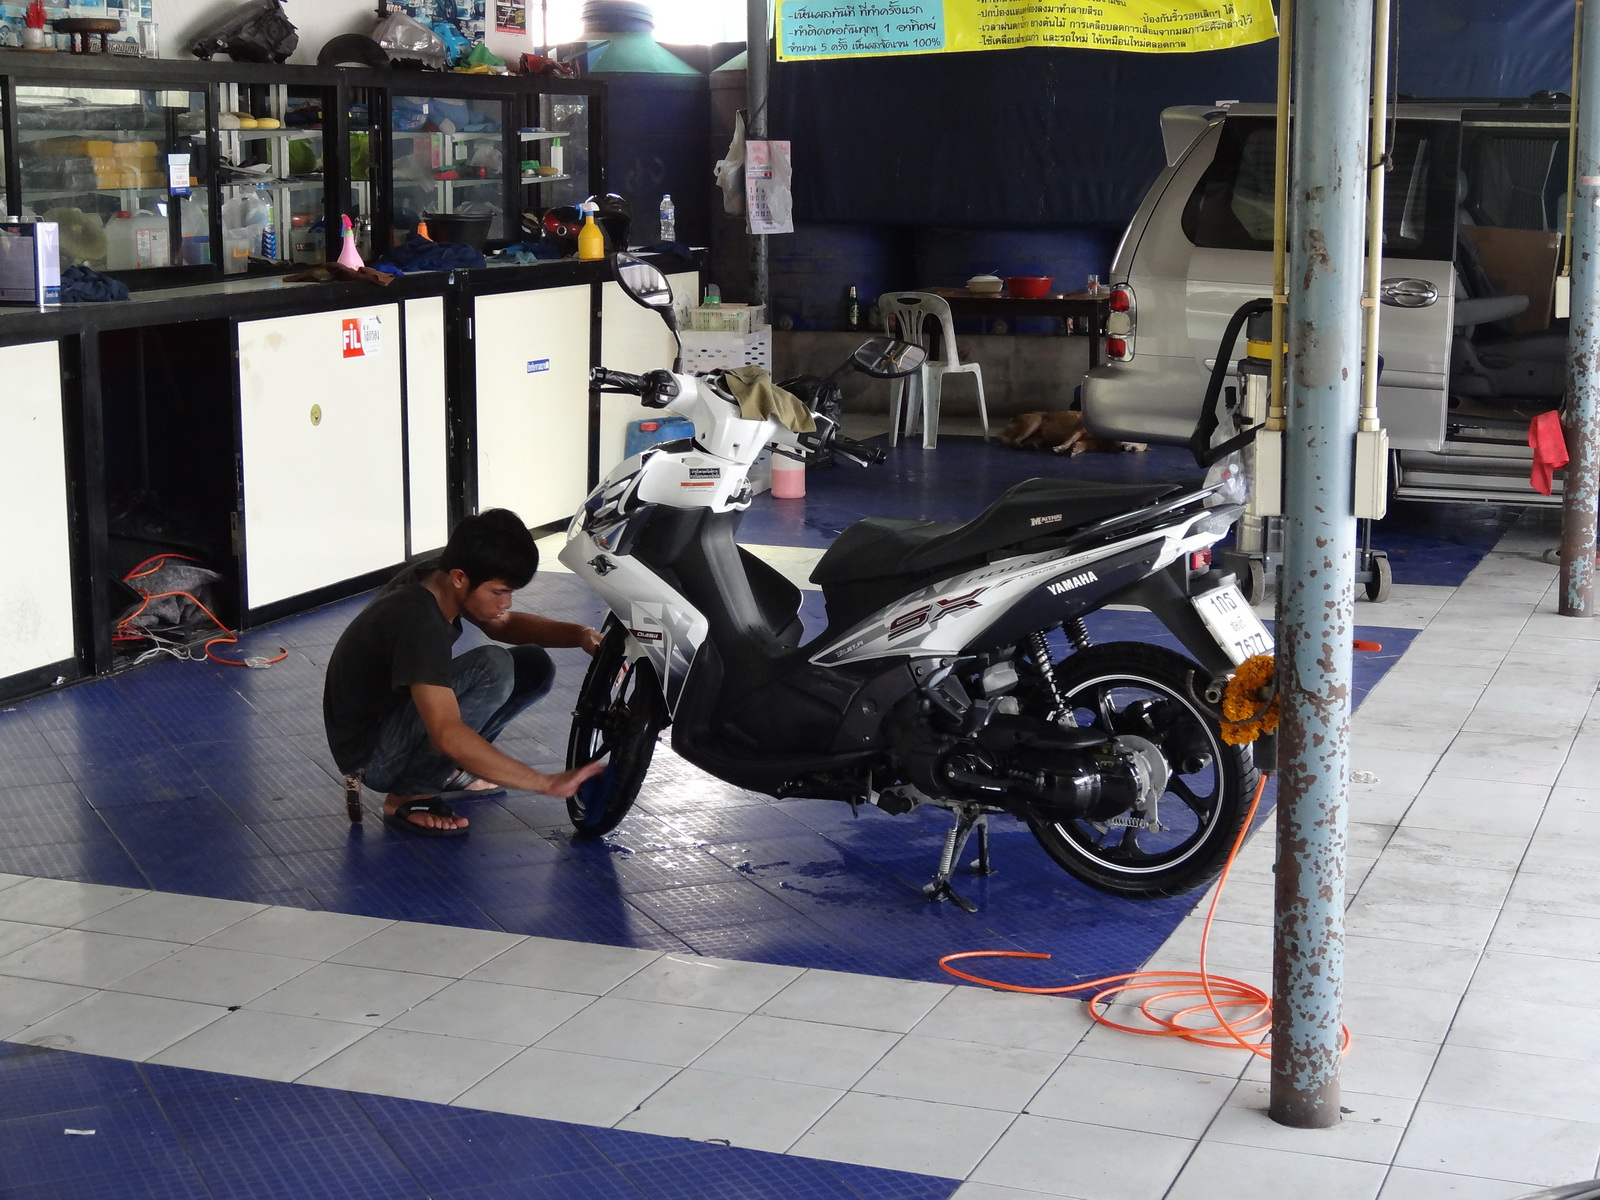 07 Pattaya 086